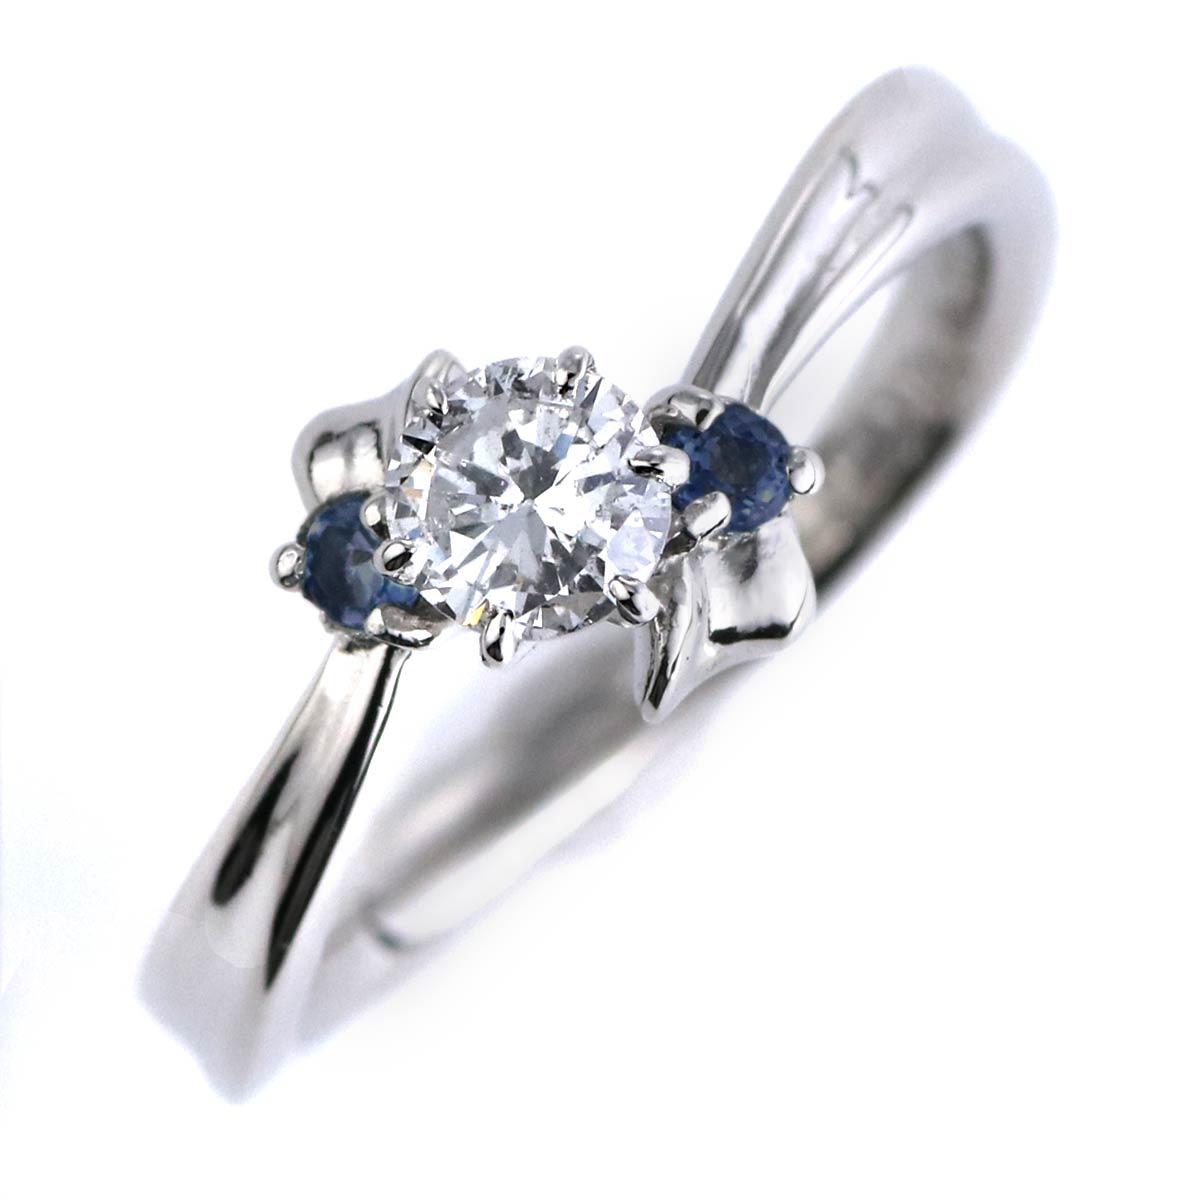 d03d95563d 婚約指輪 ダイヤモンド プラチナリング 一粒 大粒 指輪 エンゲージリング 0.4ct プロポーズ用 レディース